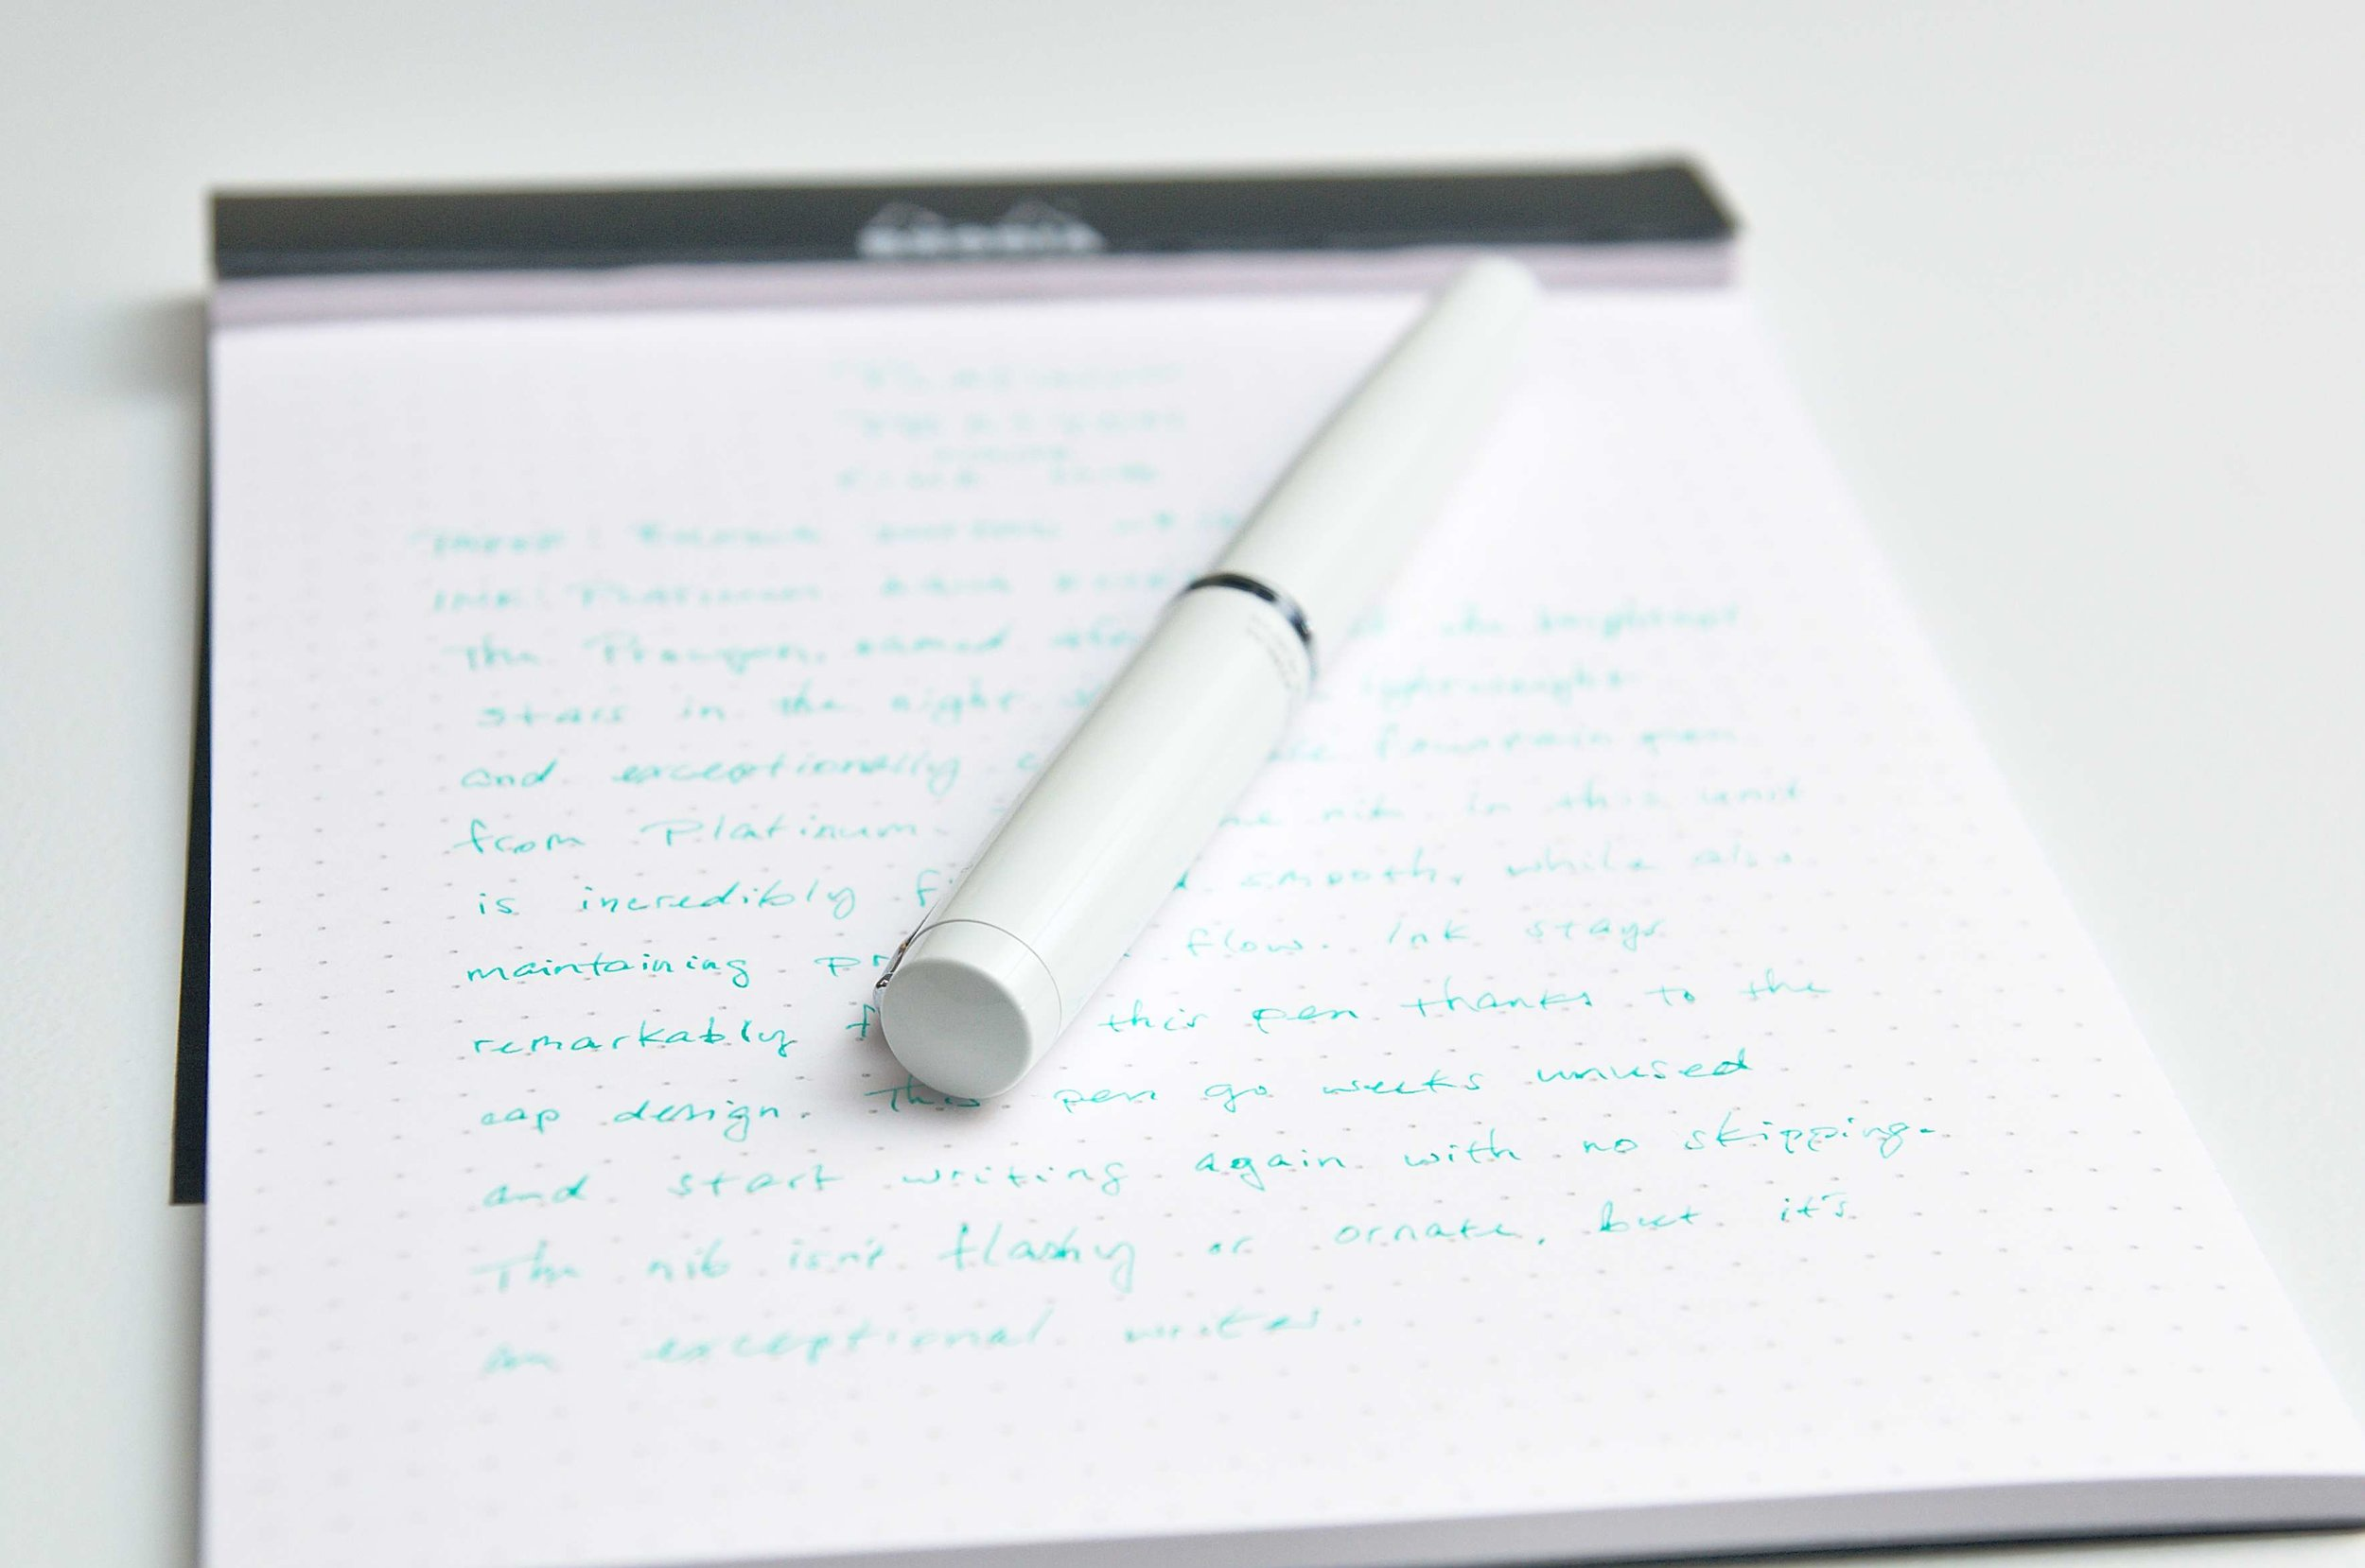 Platinum Procyon Fountain Pen Barrel